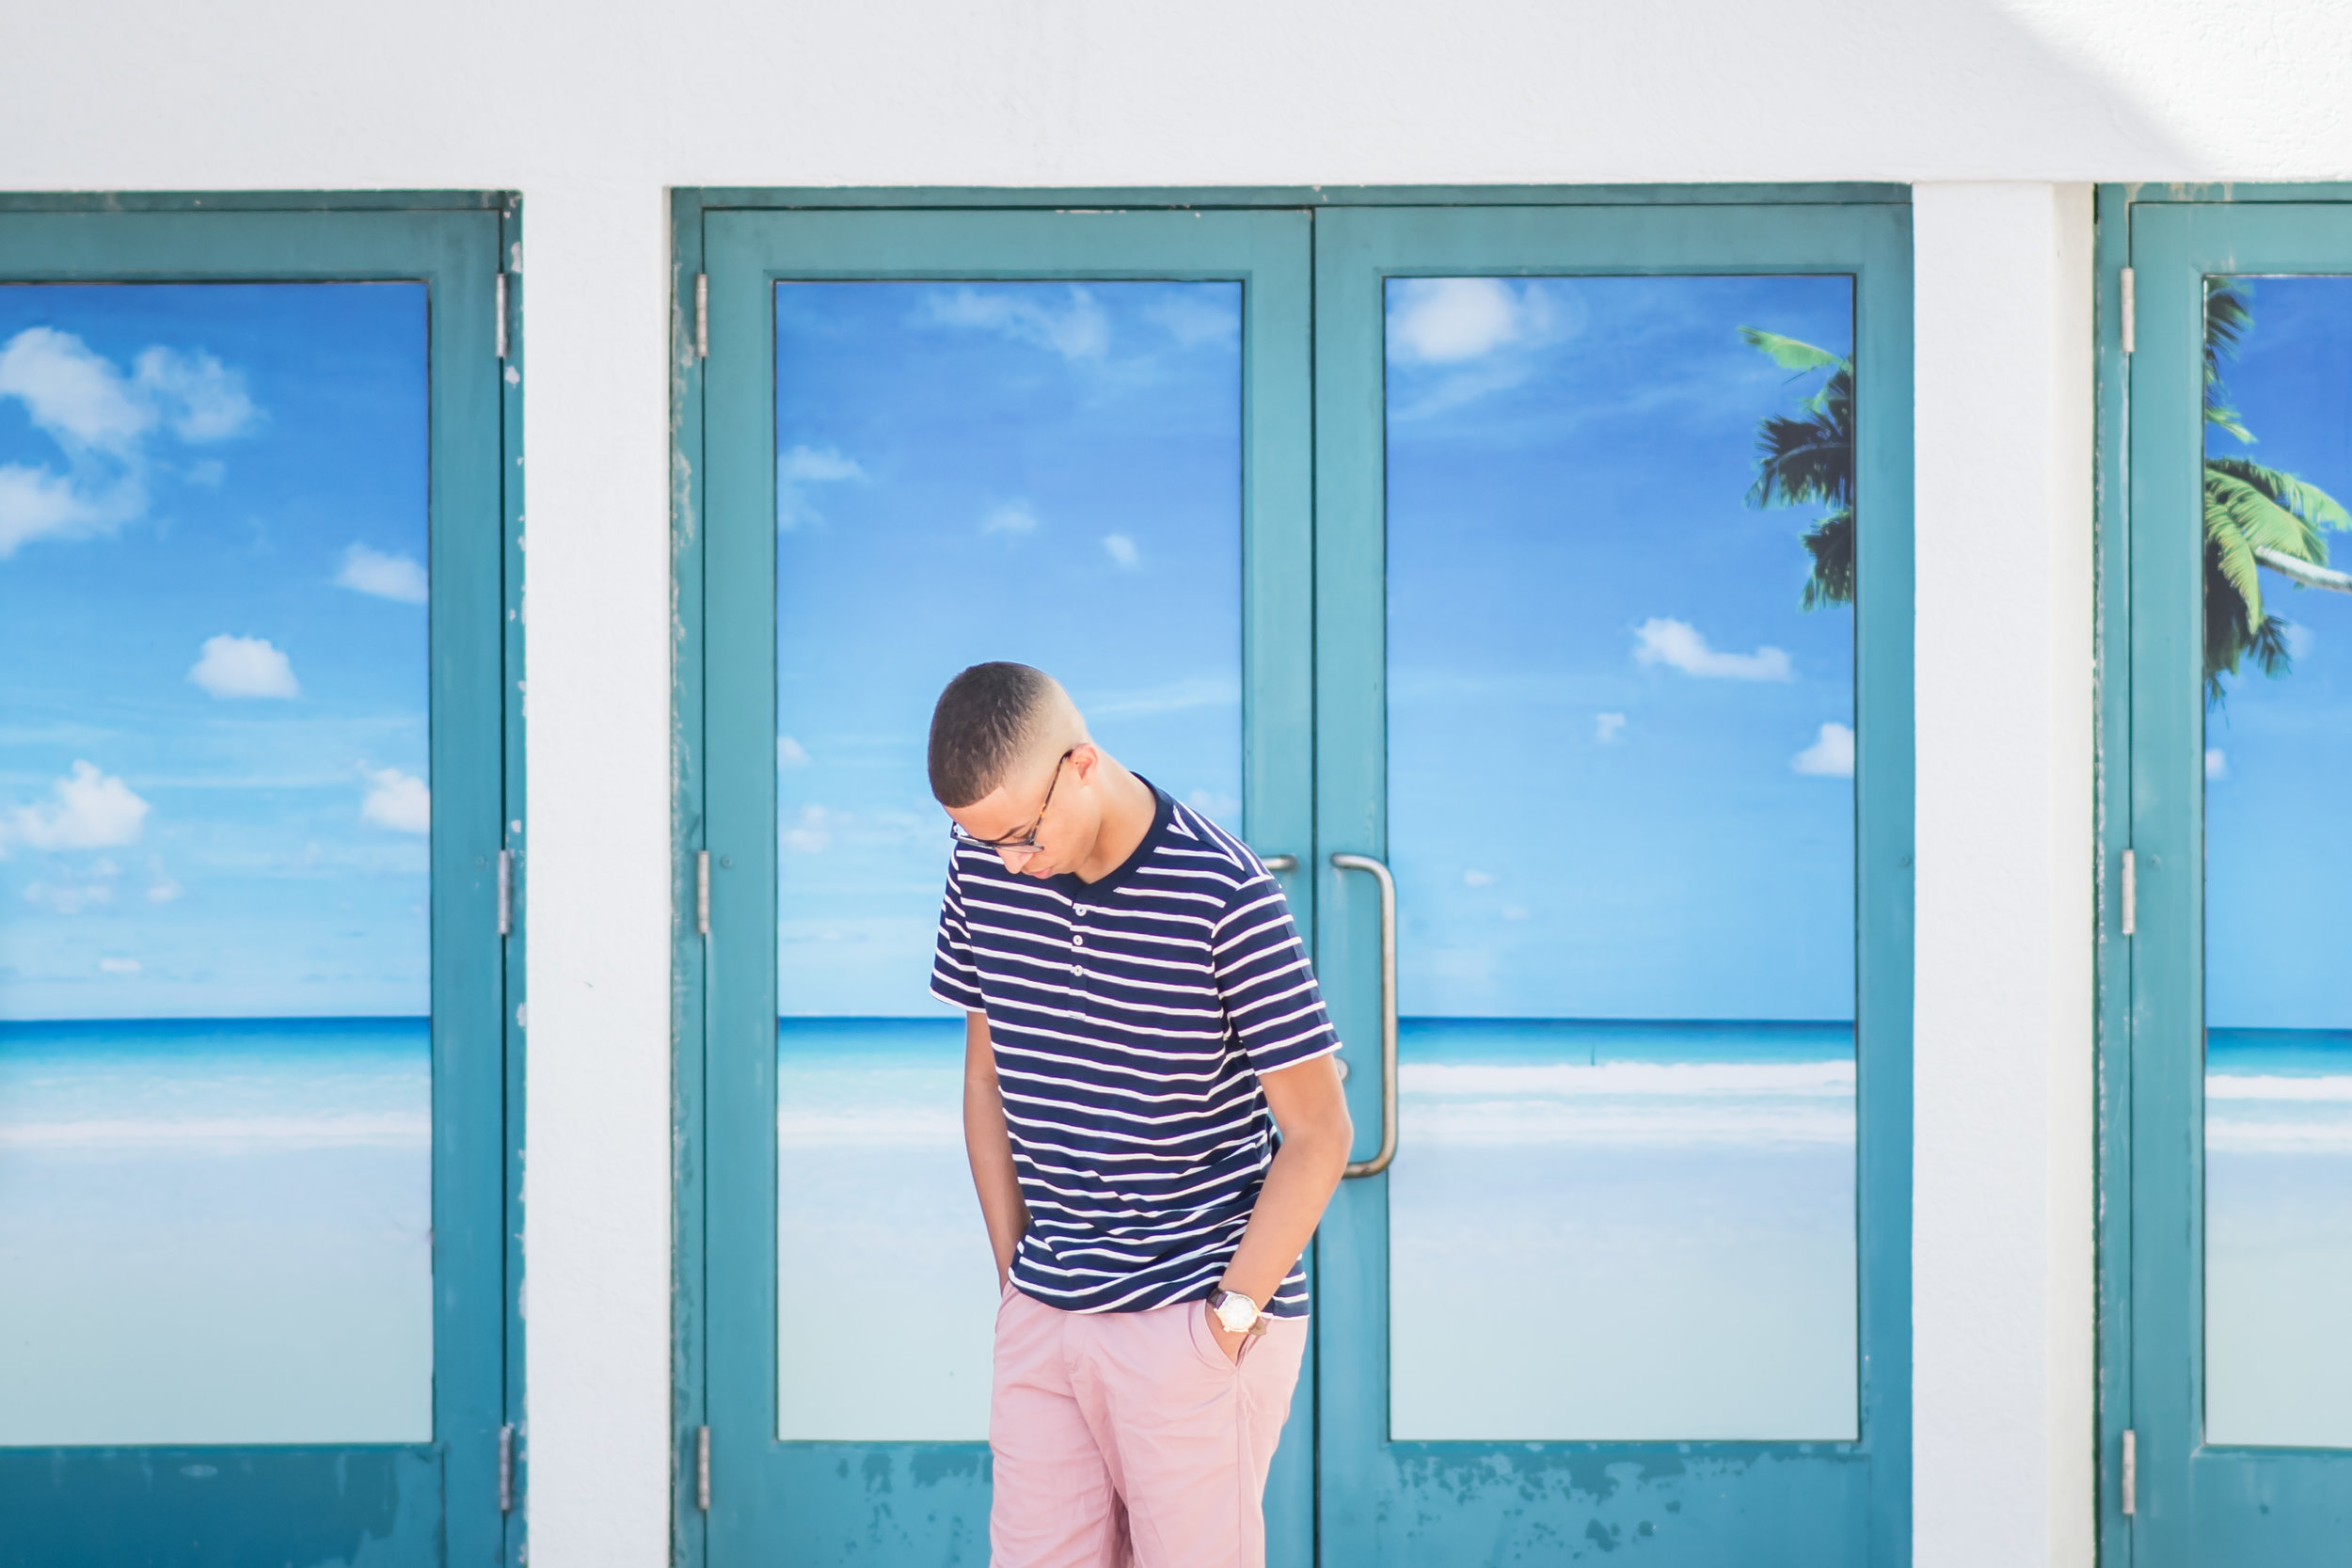 daytona-beach-men-fashion-photos-orlando-photographer-yanitza-ninett-9.jpg